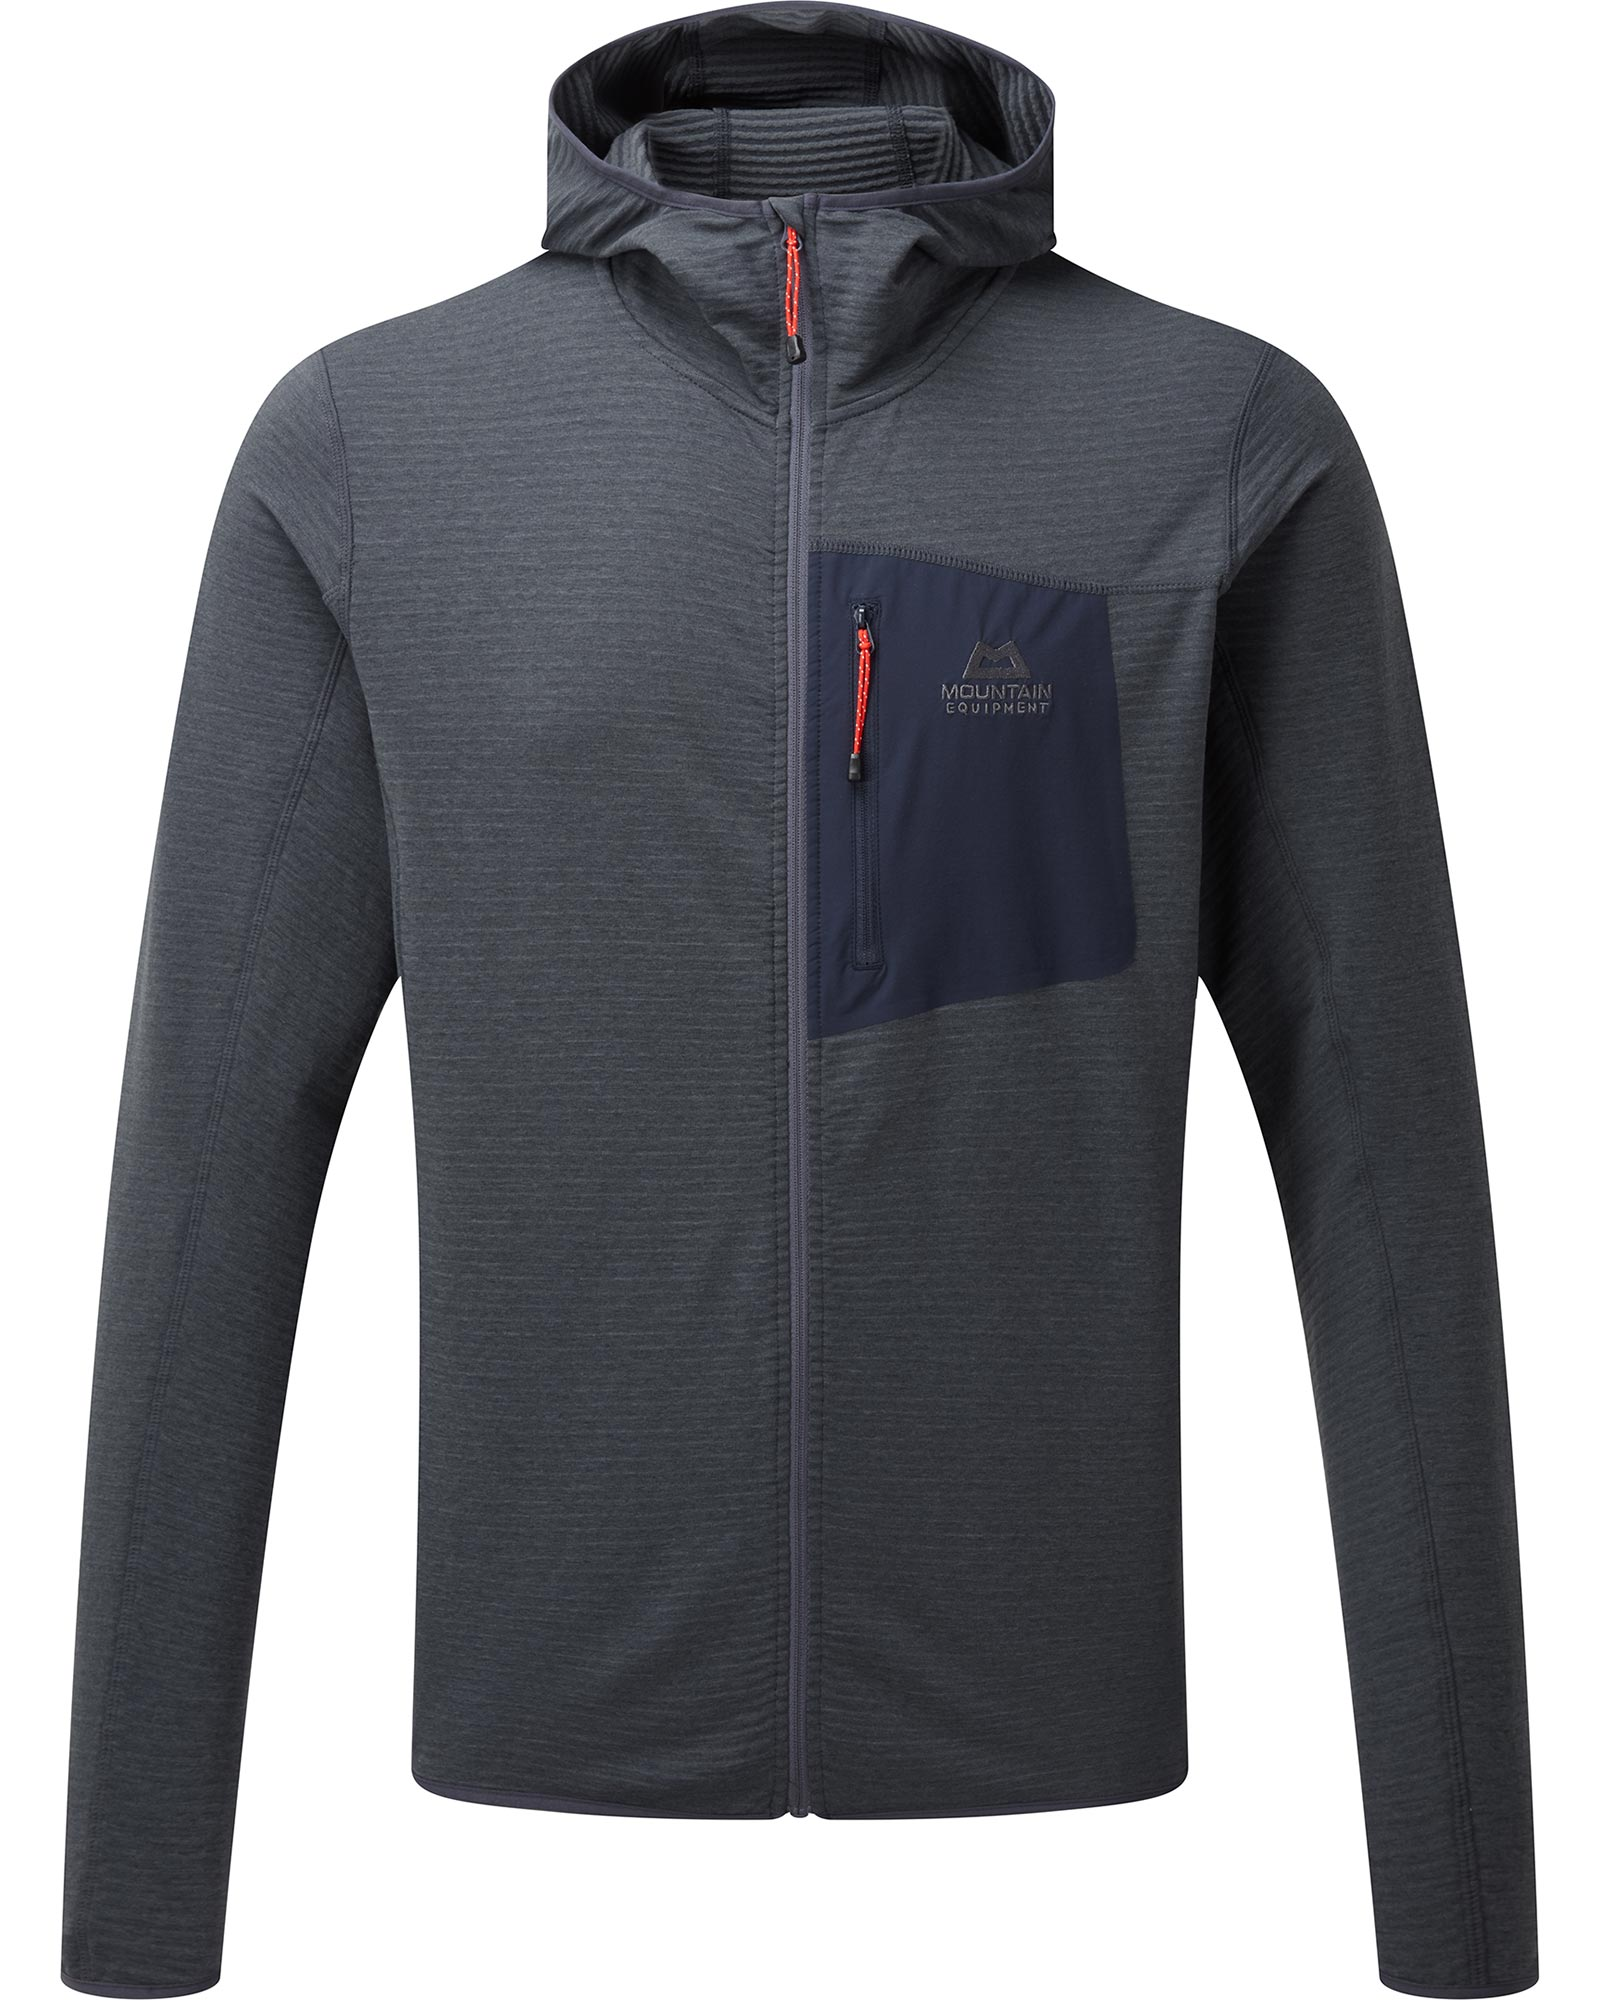 Mountain Equipment Lumiko Men's Hooded Jacket 0